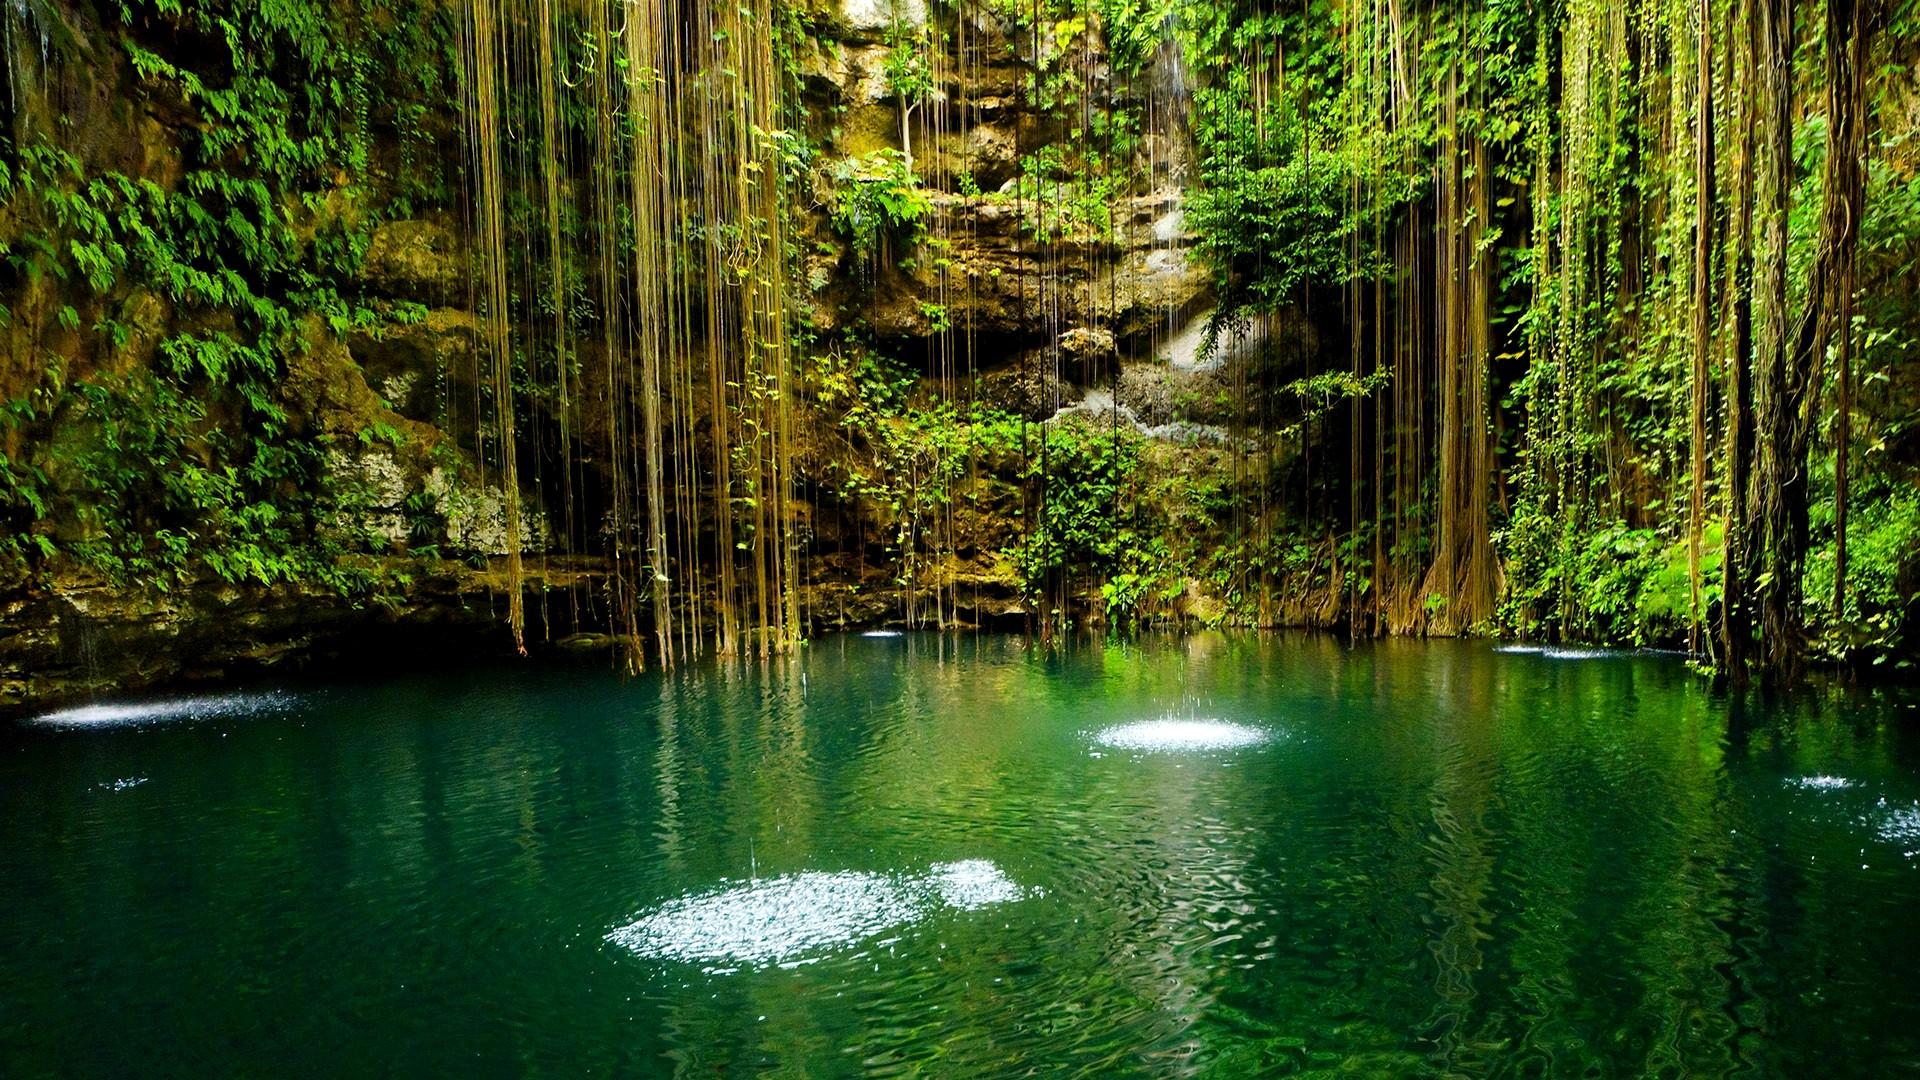 Hd wallpaper nature 1920x1080 - 1920x1080 Beautiful Nature Wallpaper Trees Mexico Yucatan Scenic Lake